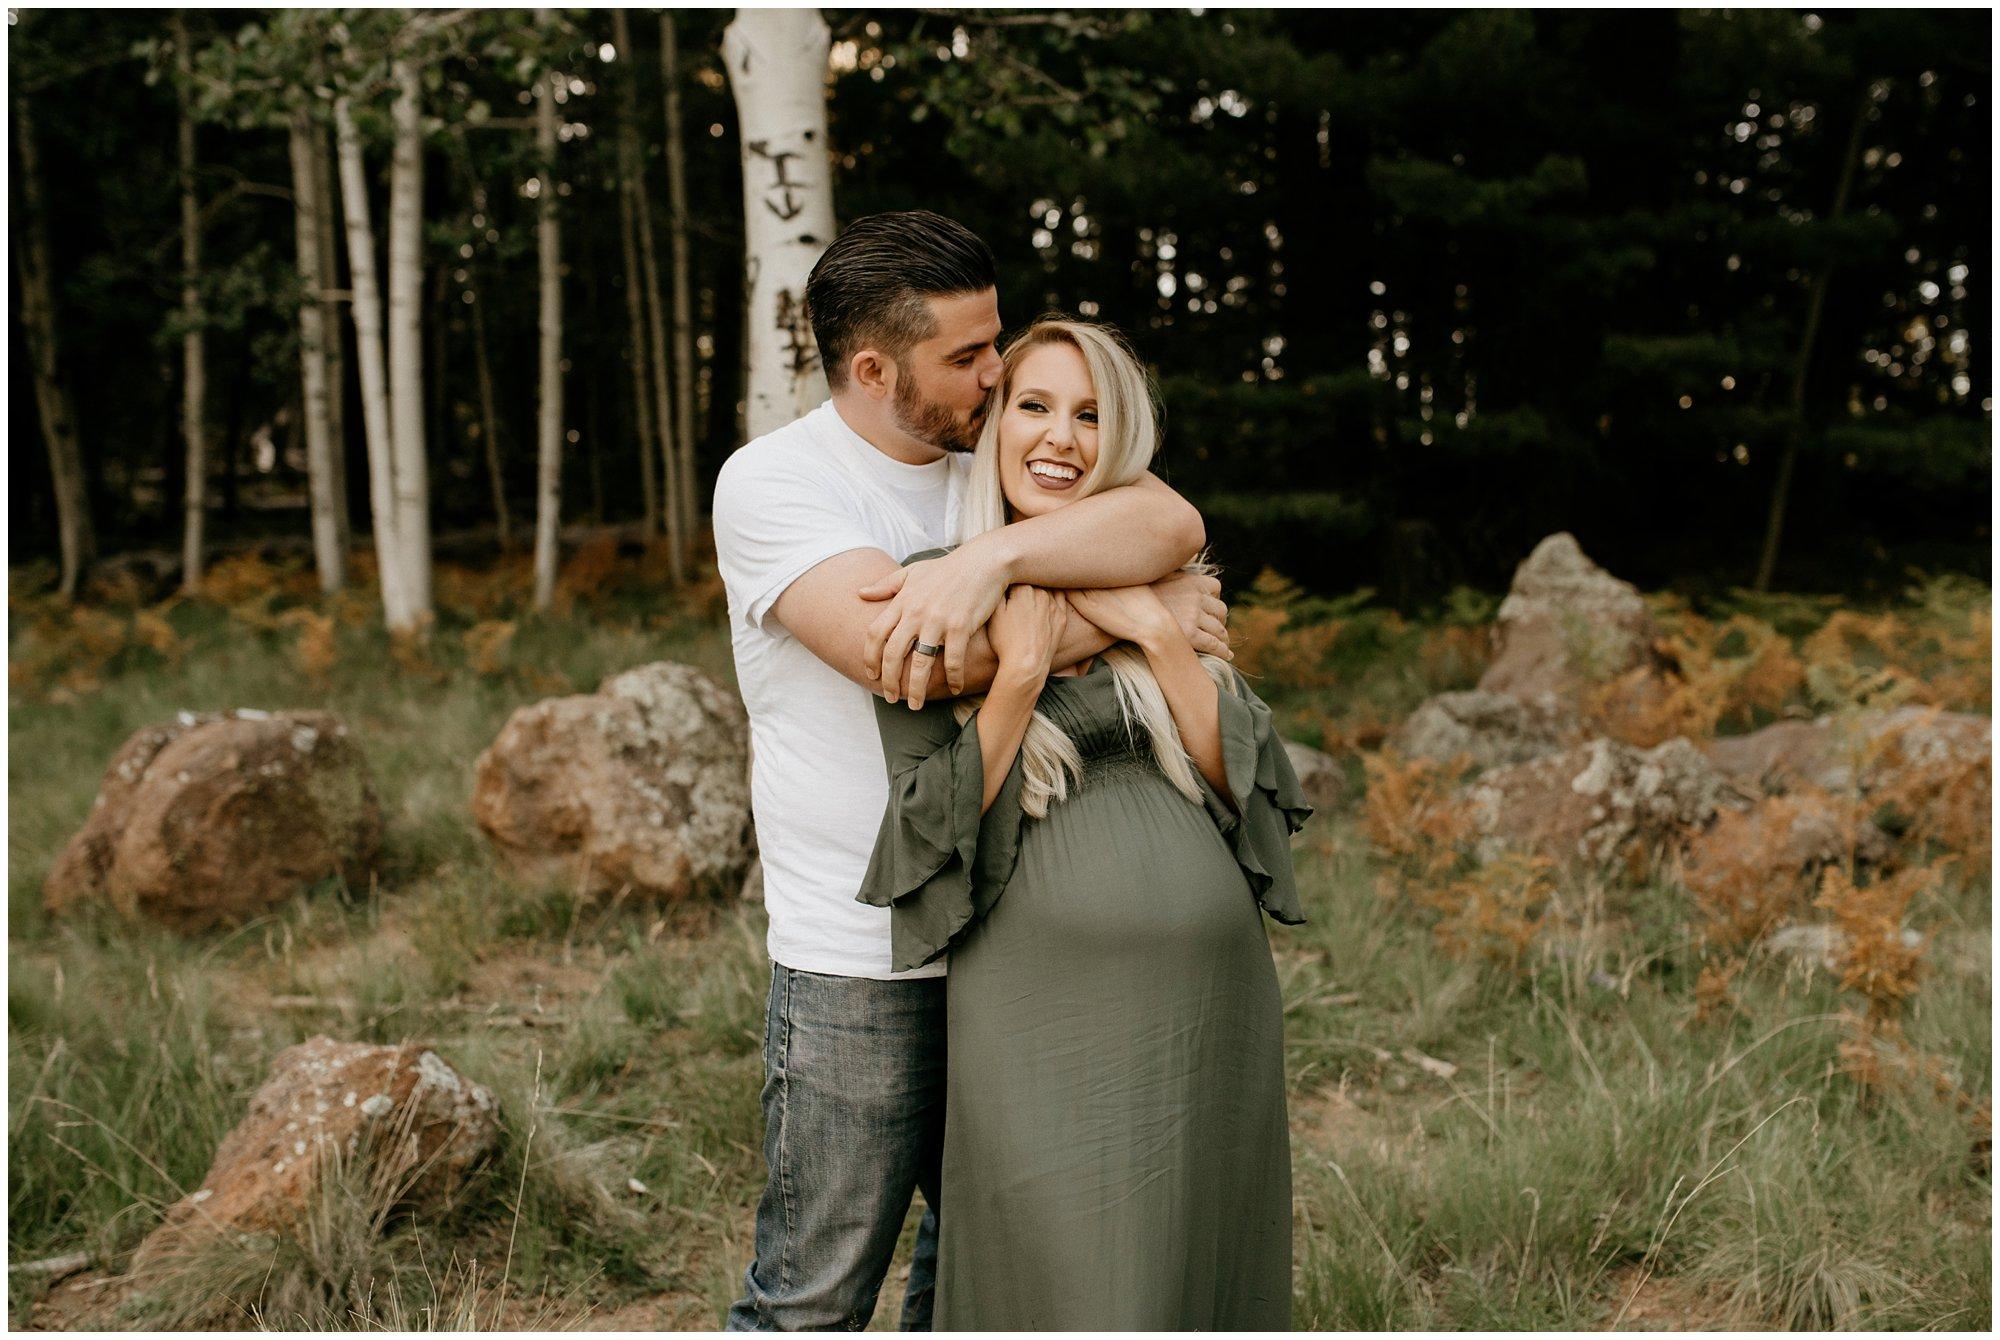 Flagstaff Aspen Tree Portrait Session - Gabby + Gary - Ashtyn Nicole Photo_0021.jpg